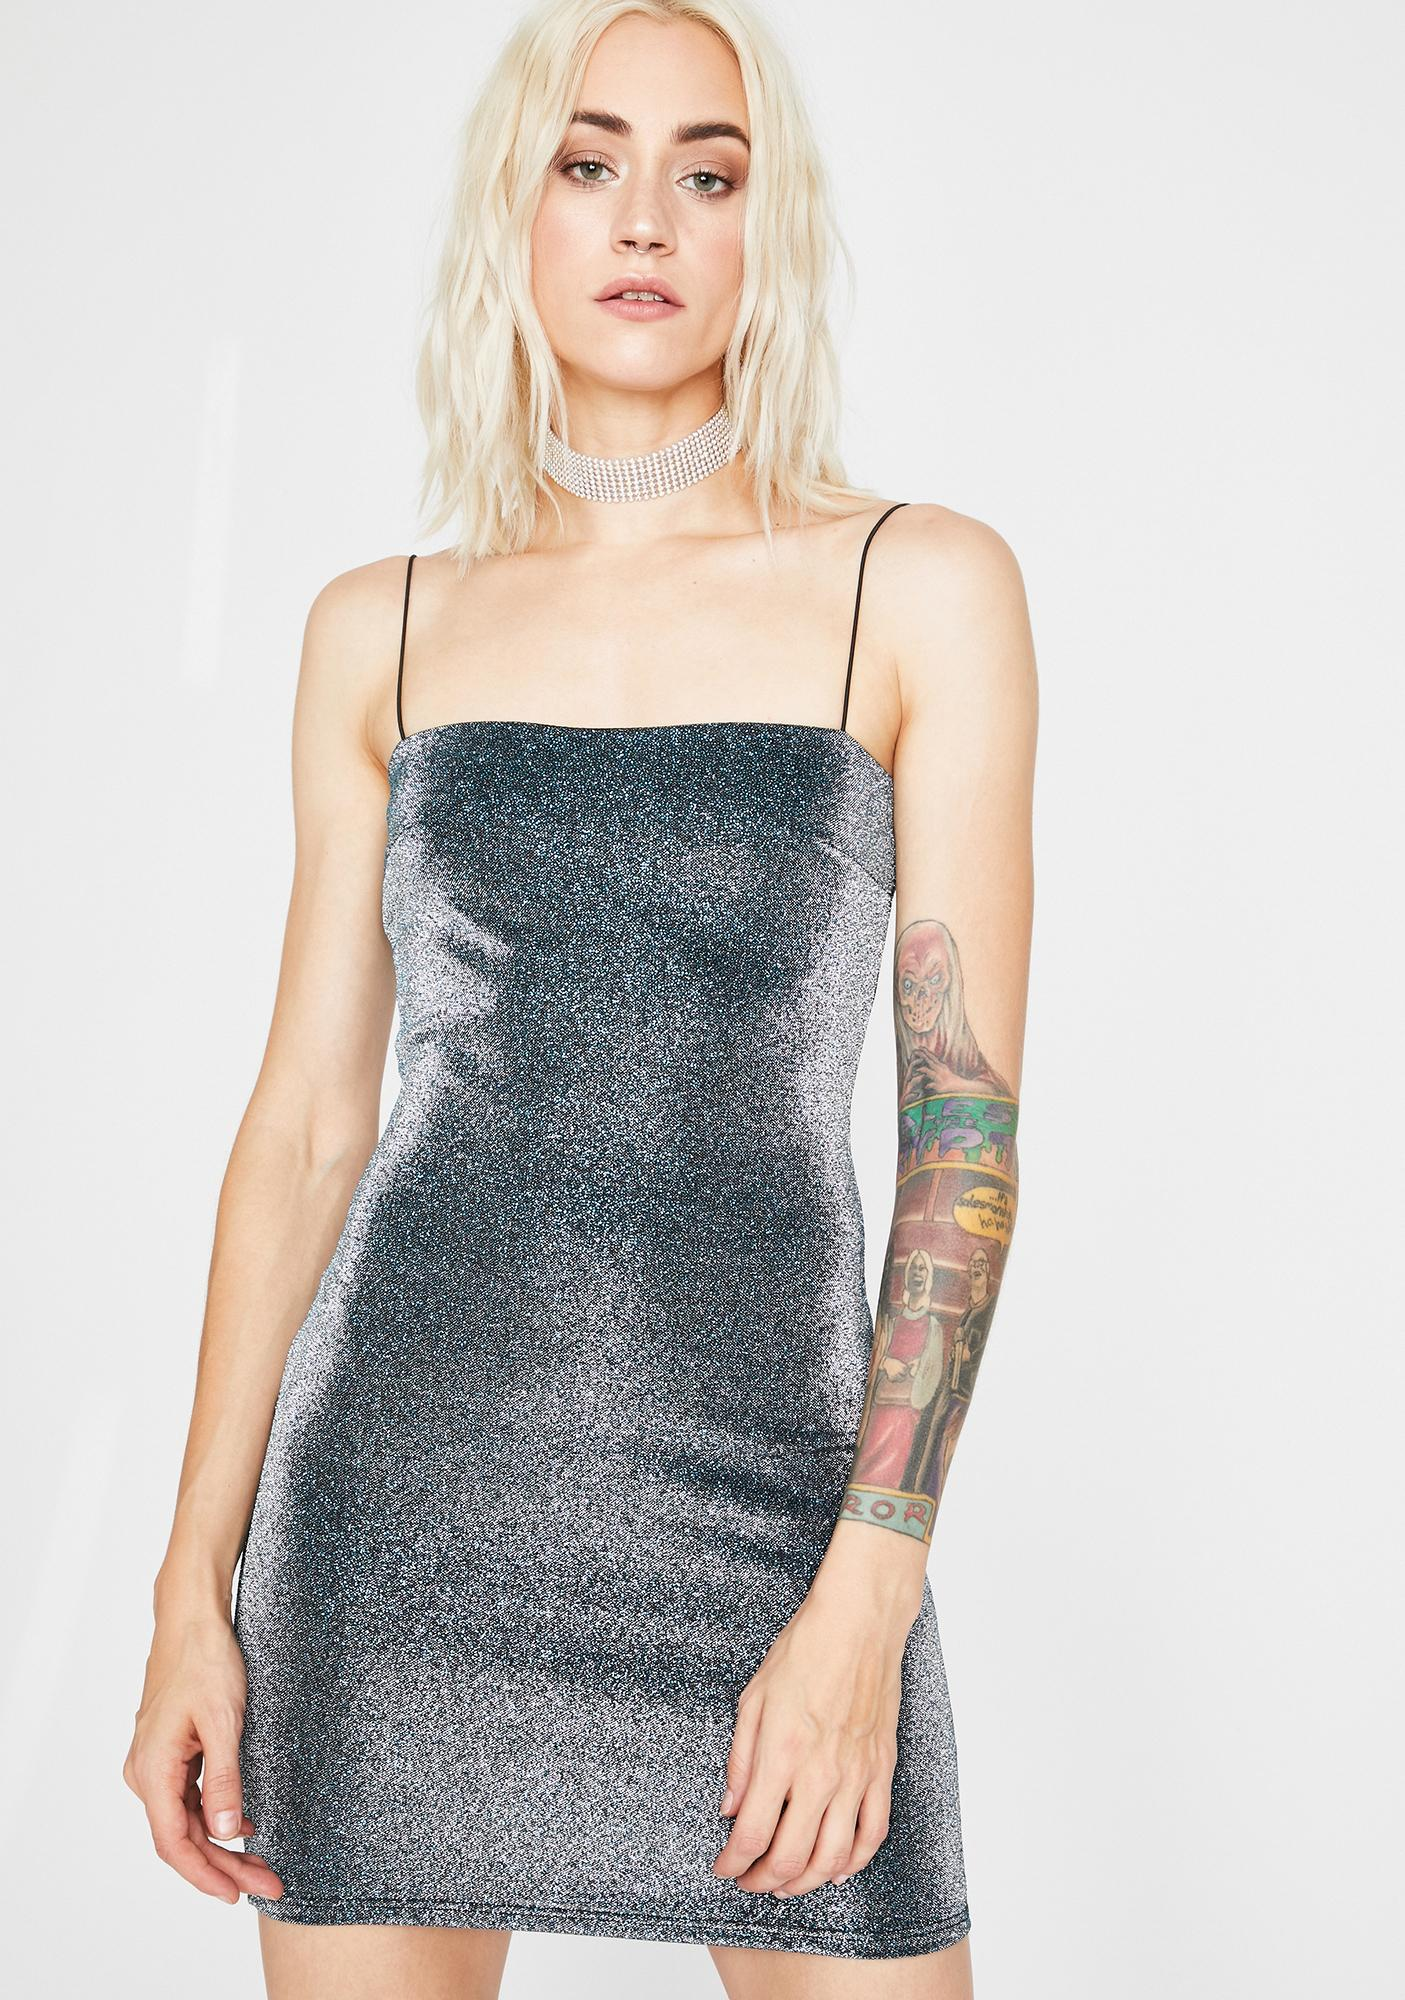 Starstruck Stunna Mini Dress